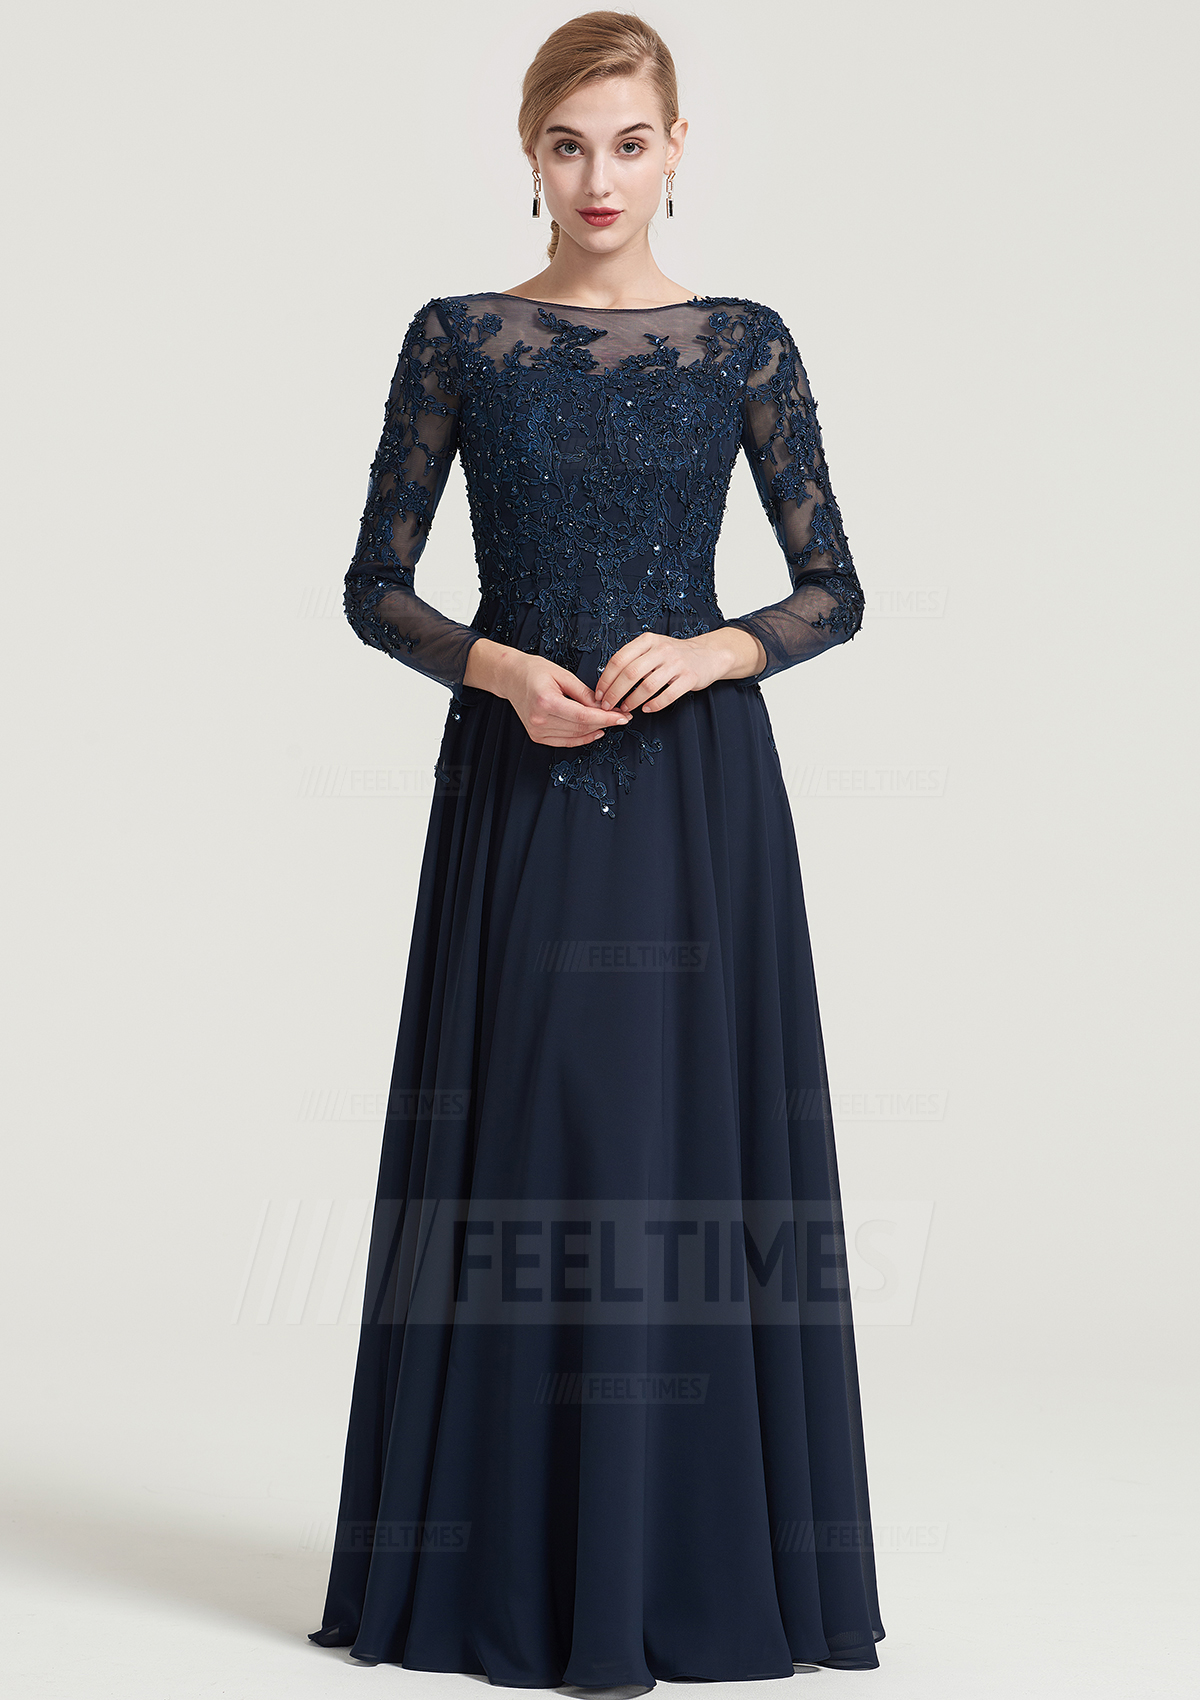 A-Line/Princess Bateau 3/4 Sleeve Long/Floor-Length Chiffon Dress With Beading Appliqued